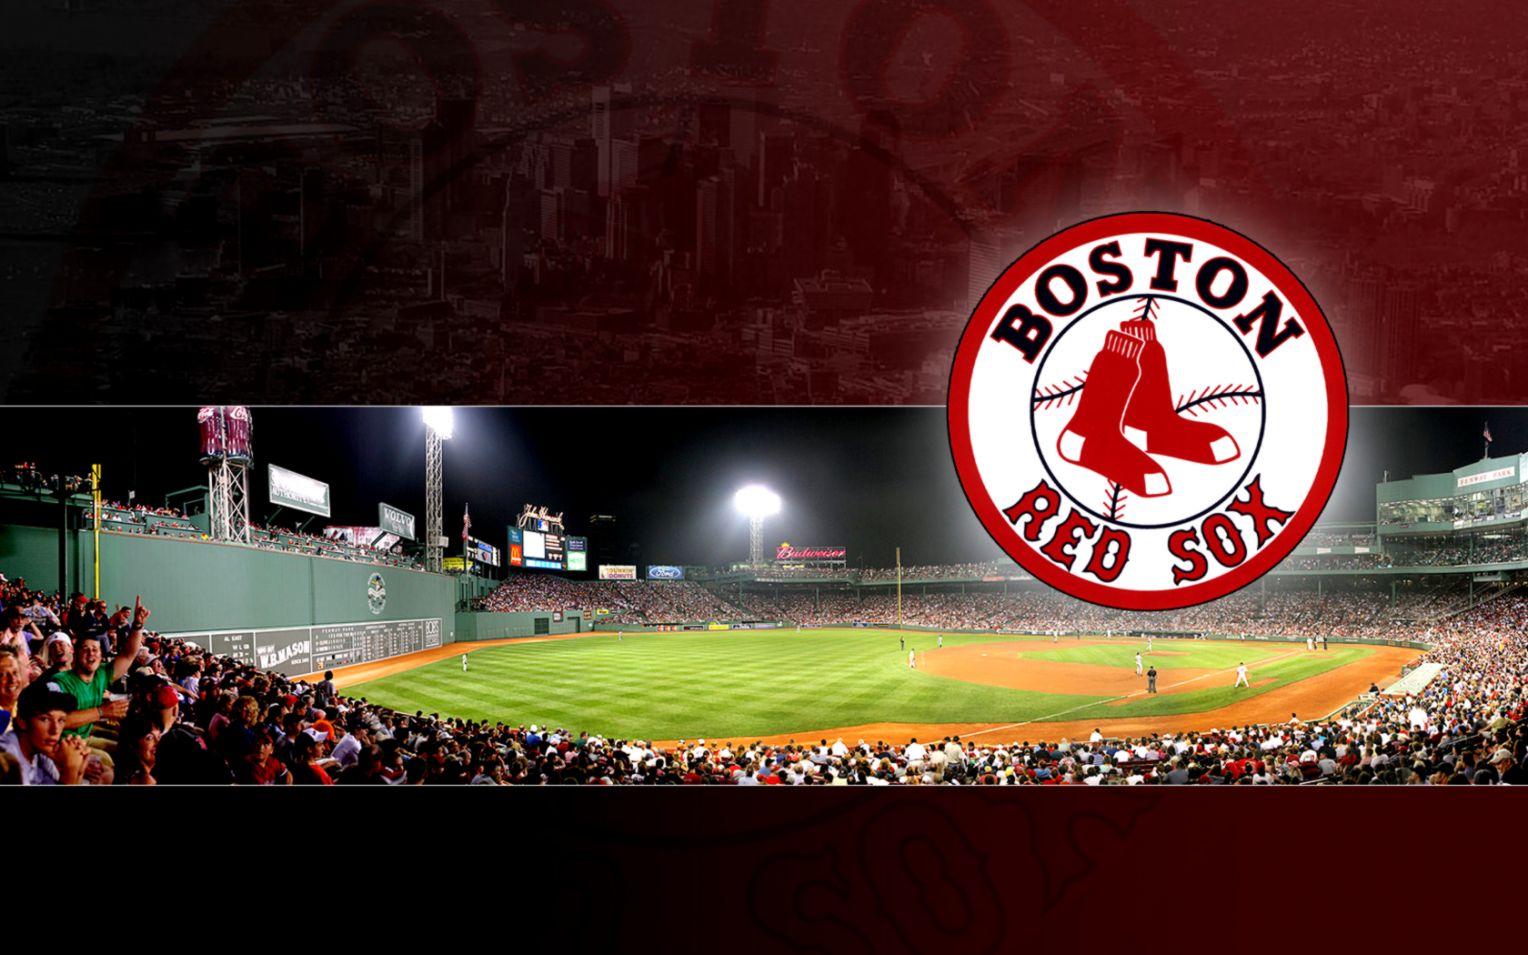 Boston Red Sox Hd Background Wallpaper Wallpapers Ninja 1528x955